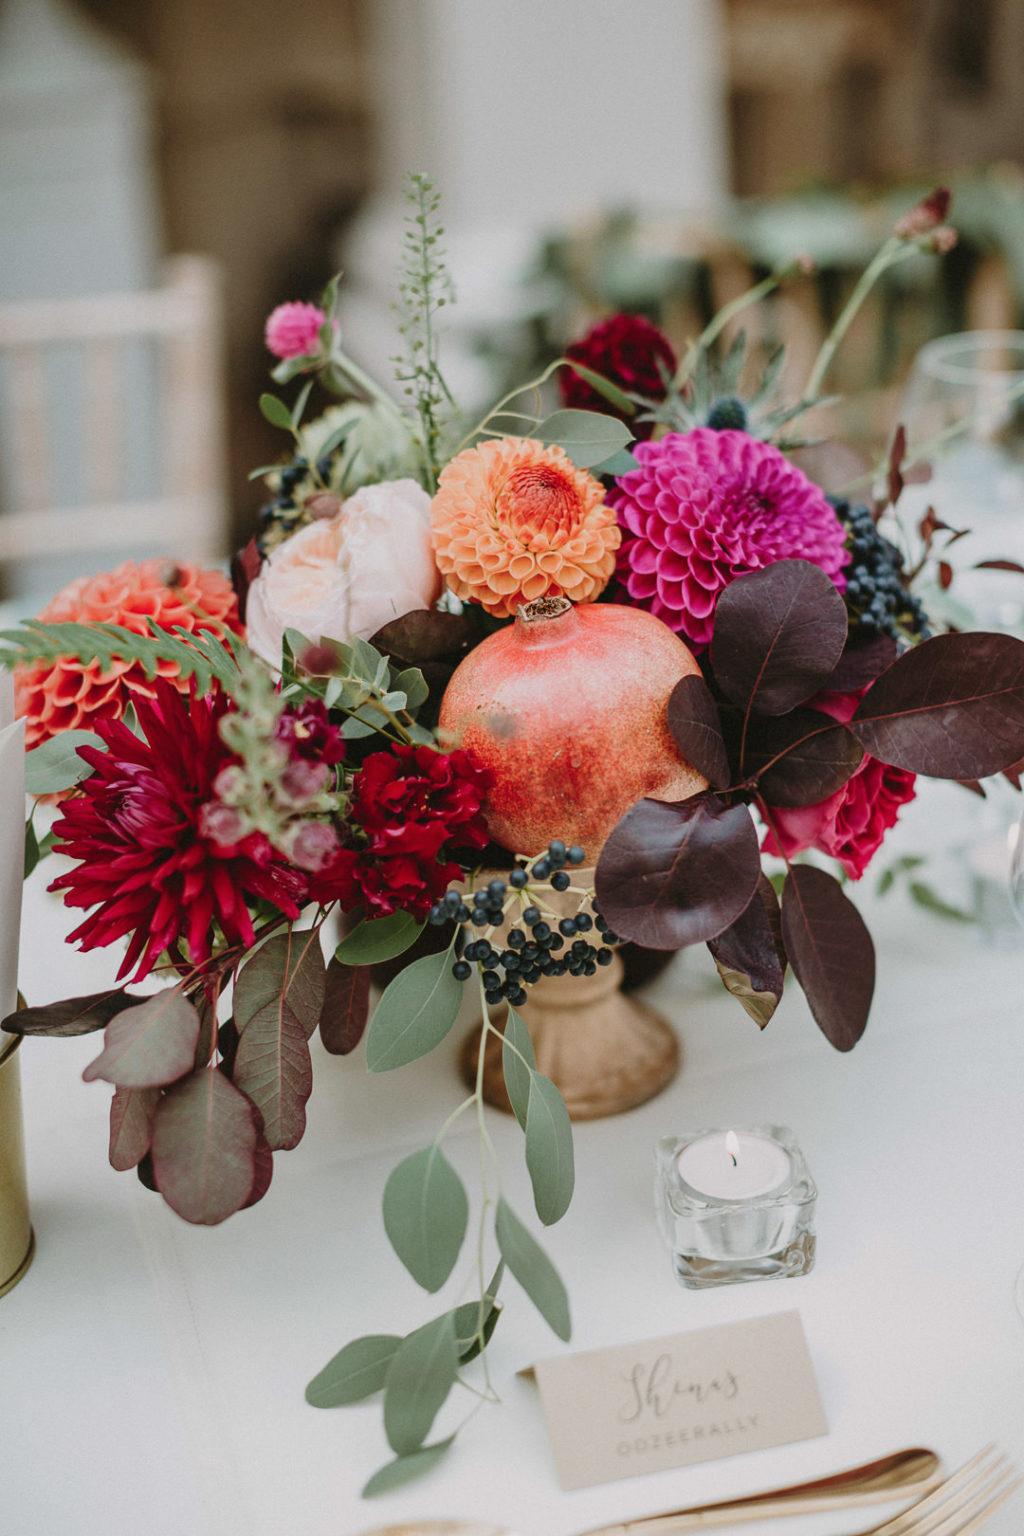 Colourful-wedding-at-Tankardstown-House-jewel-tones-Rafal-Borek-35.jpg